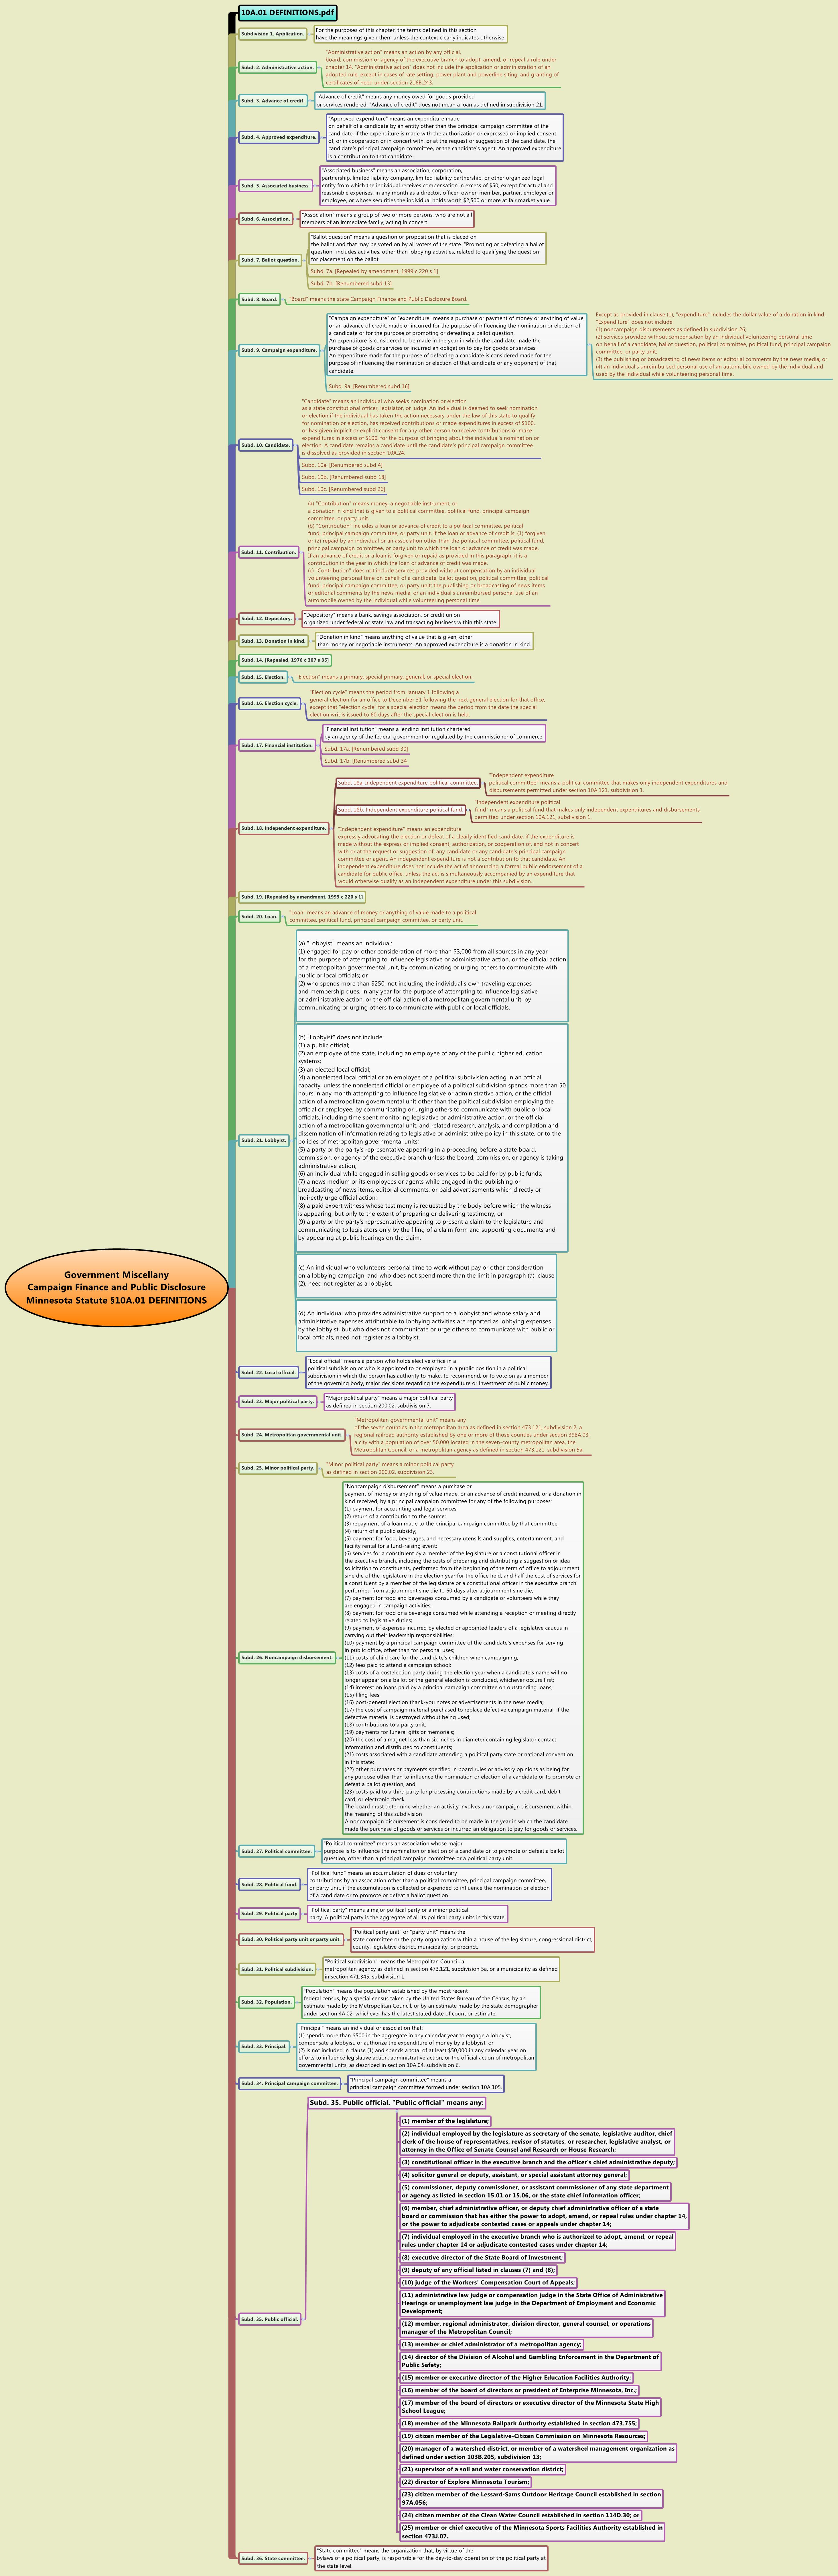 Thumbnail of mind map